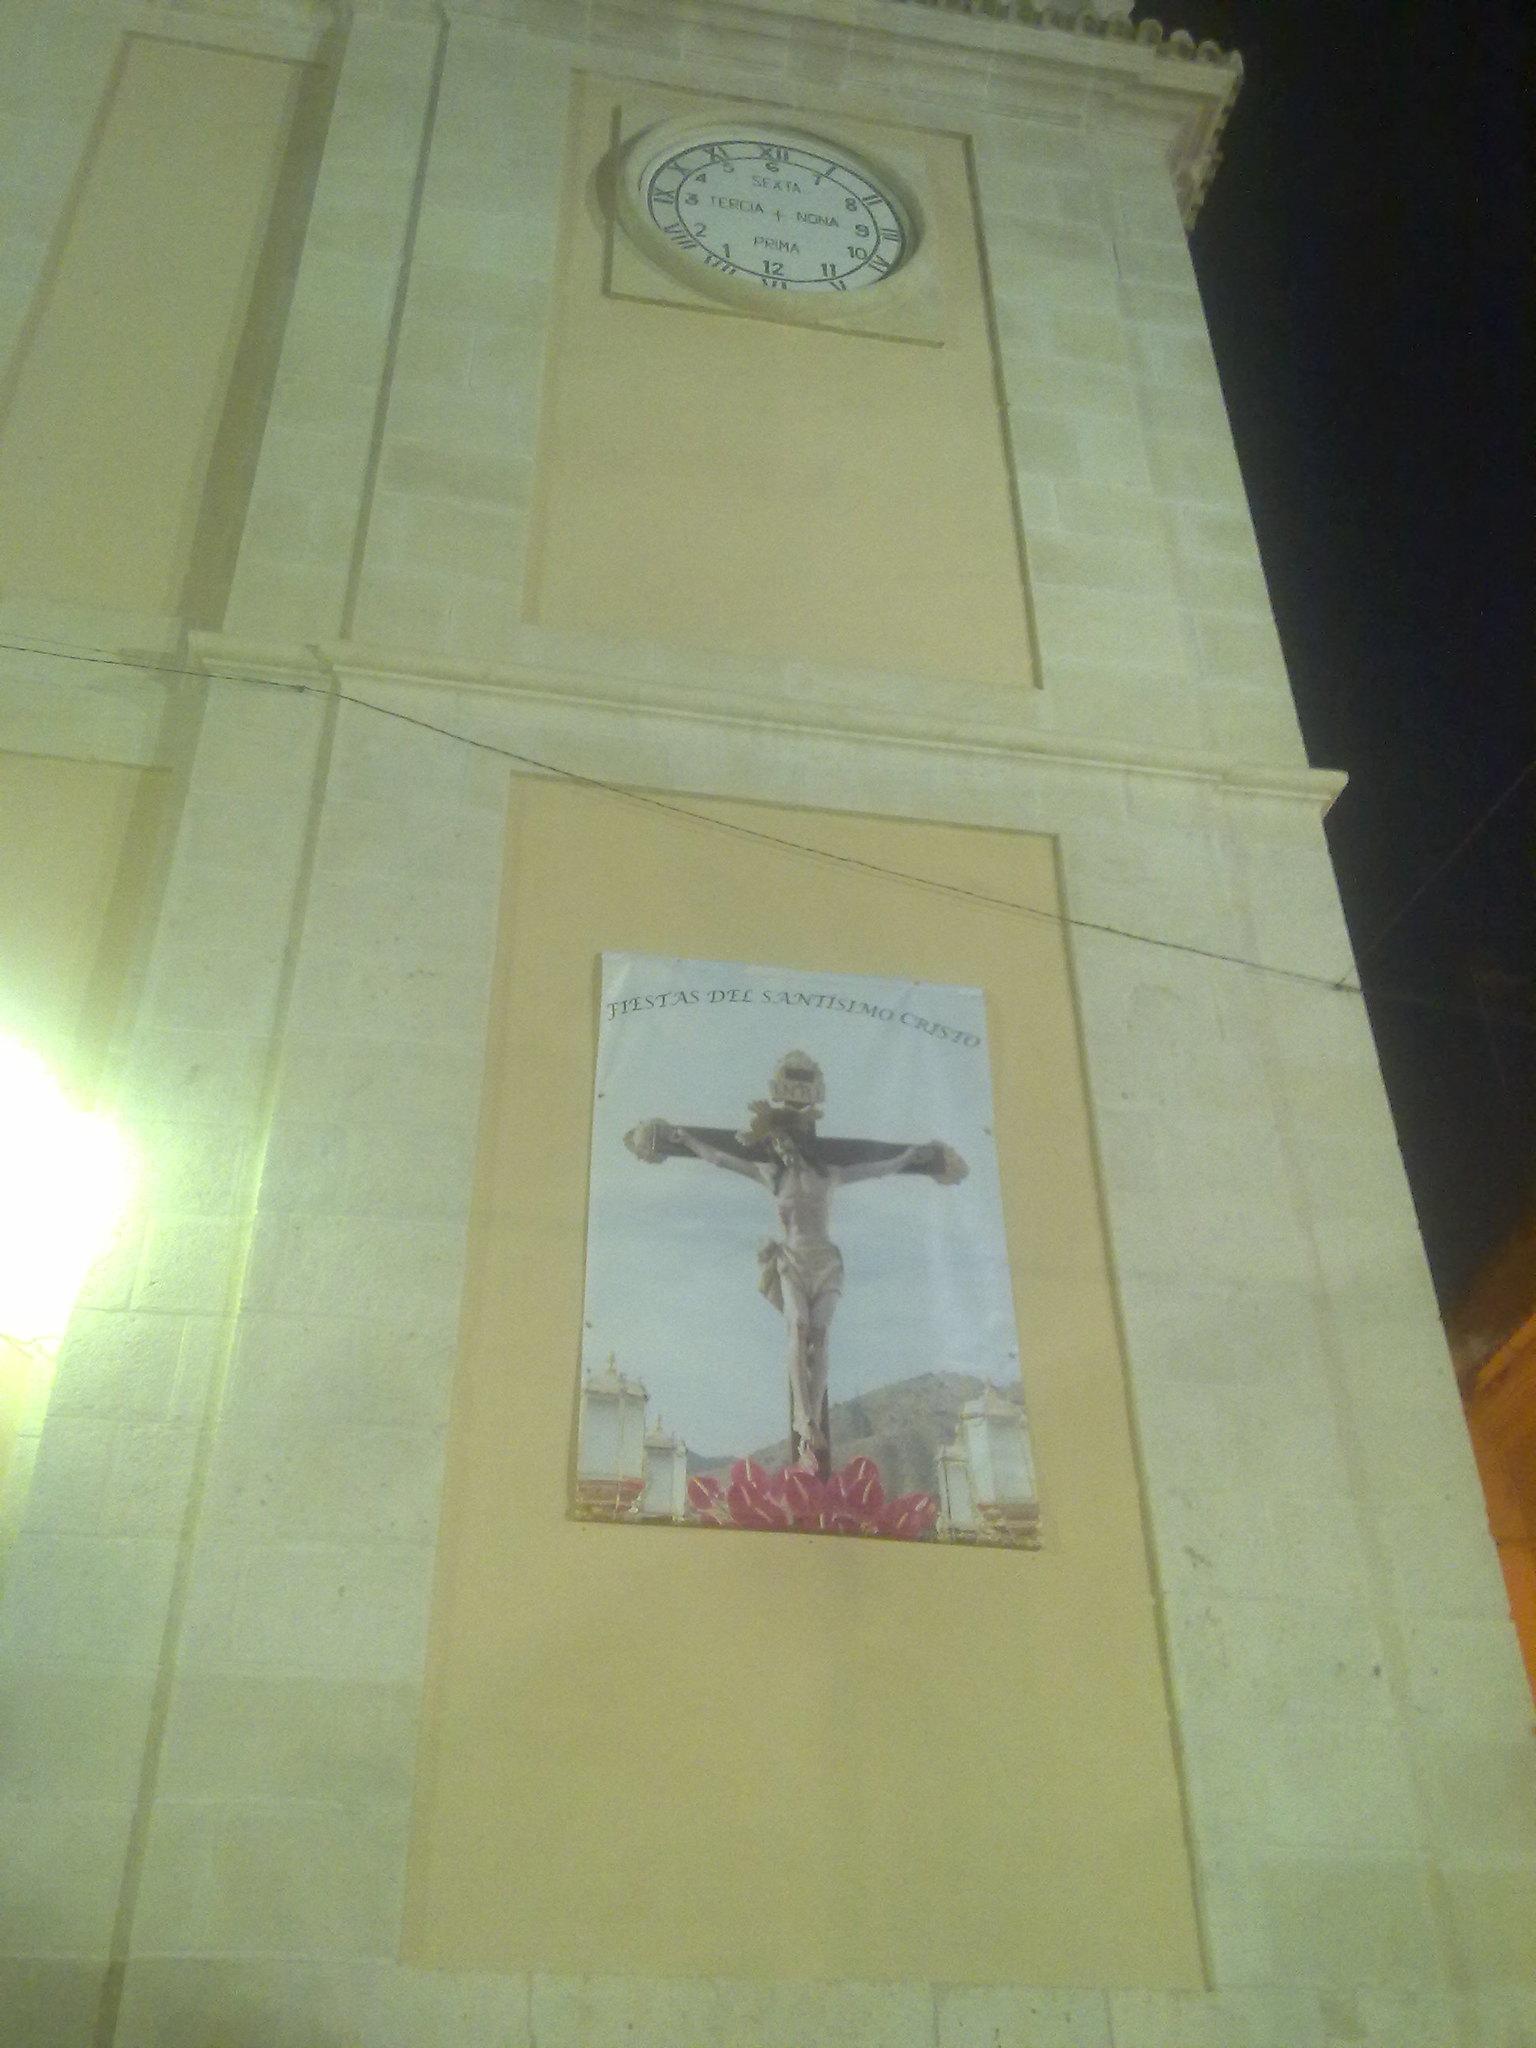 (2012-06-29) - Cocierto Rondalla CEAM - José vicente Romero Ripoll (09)